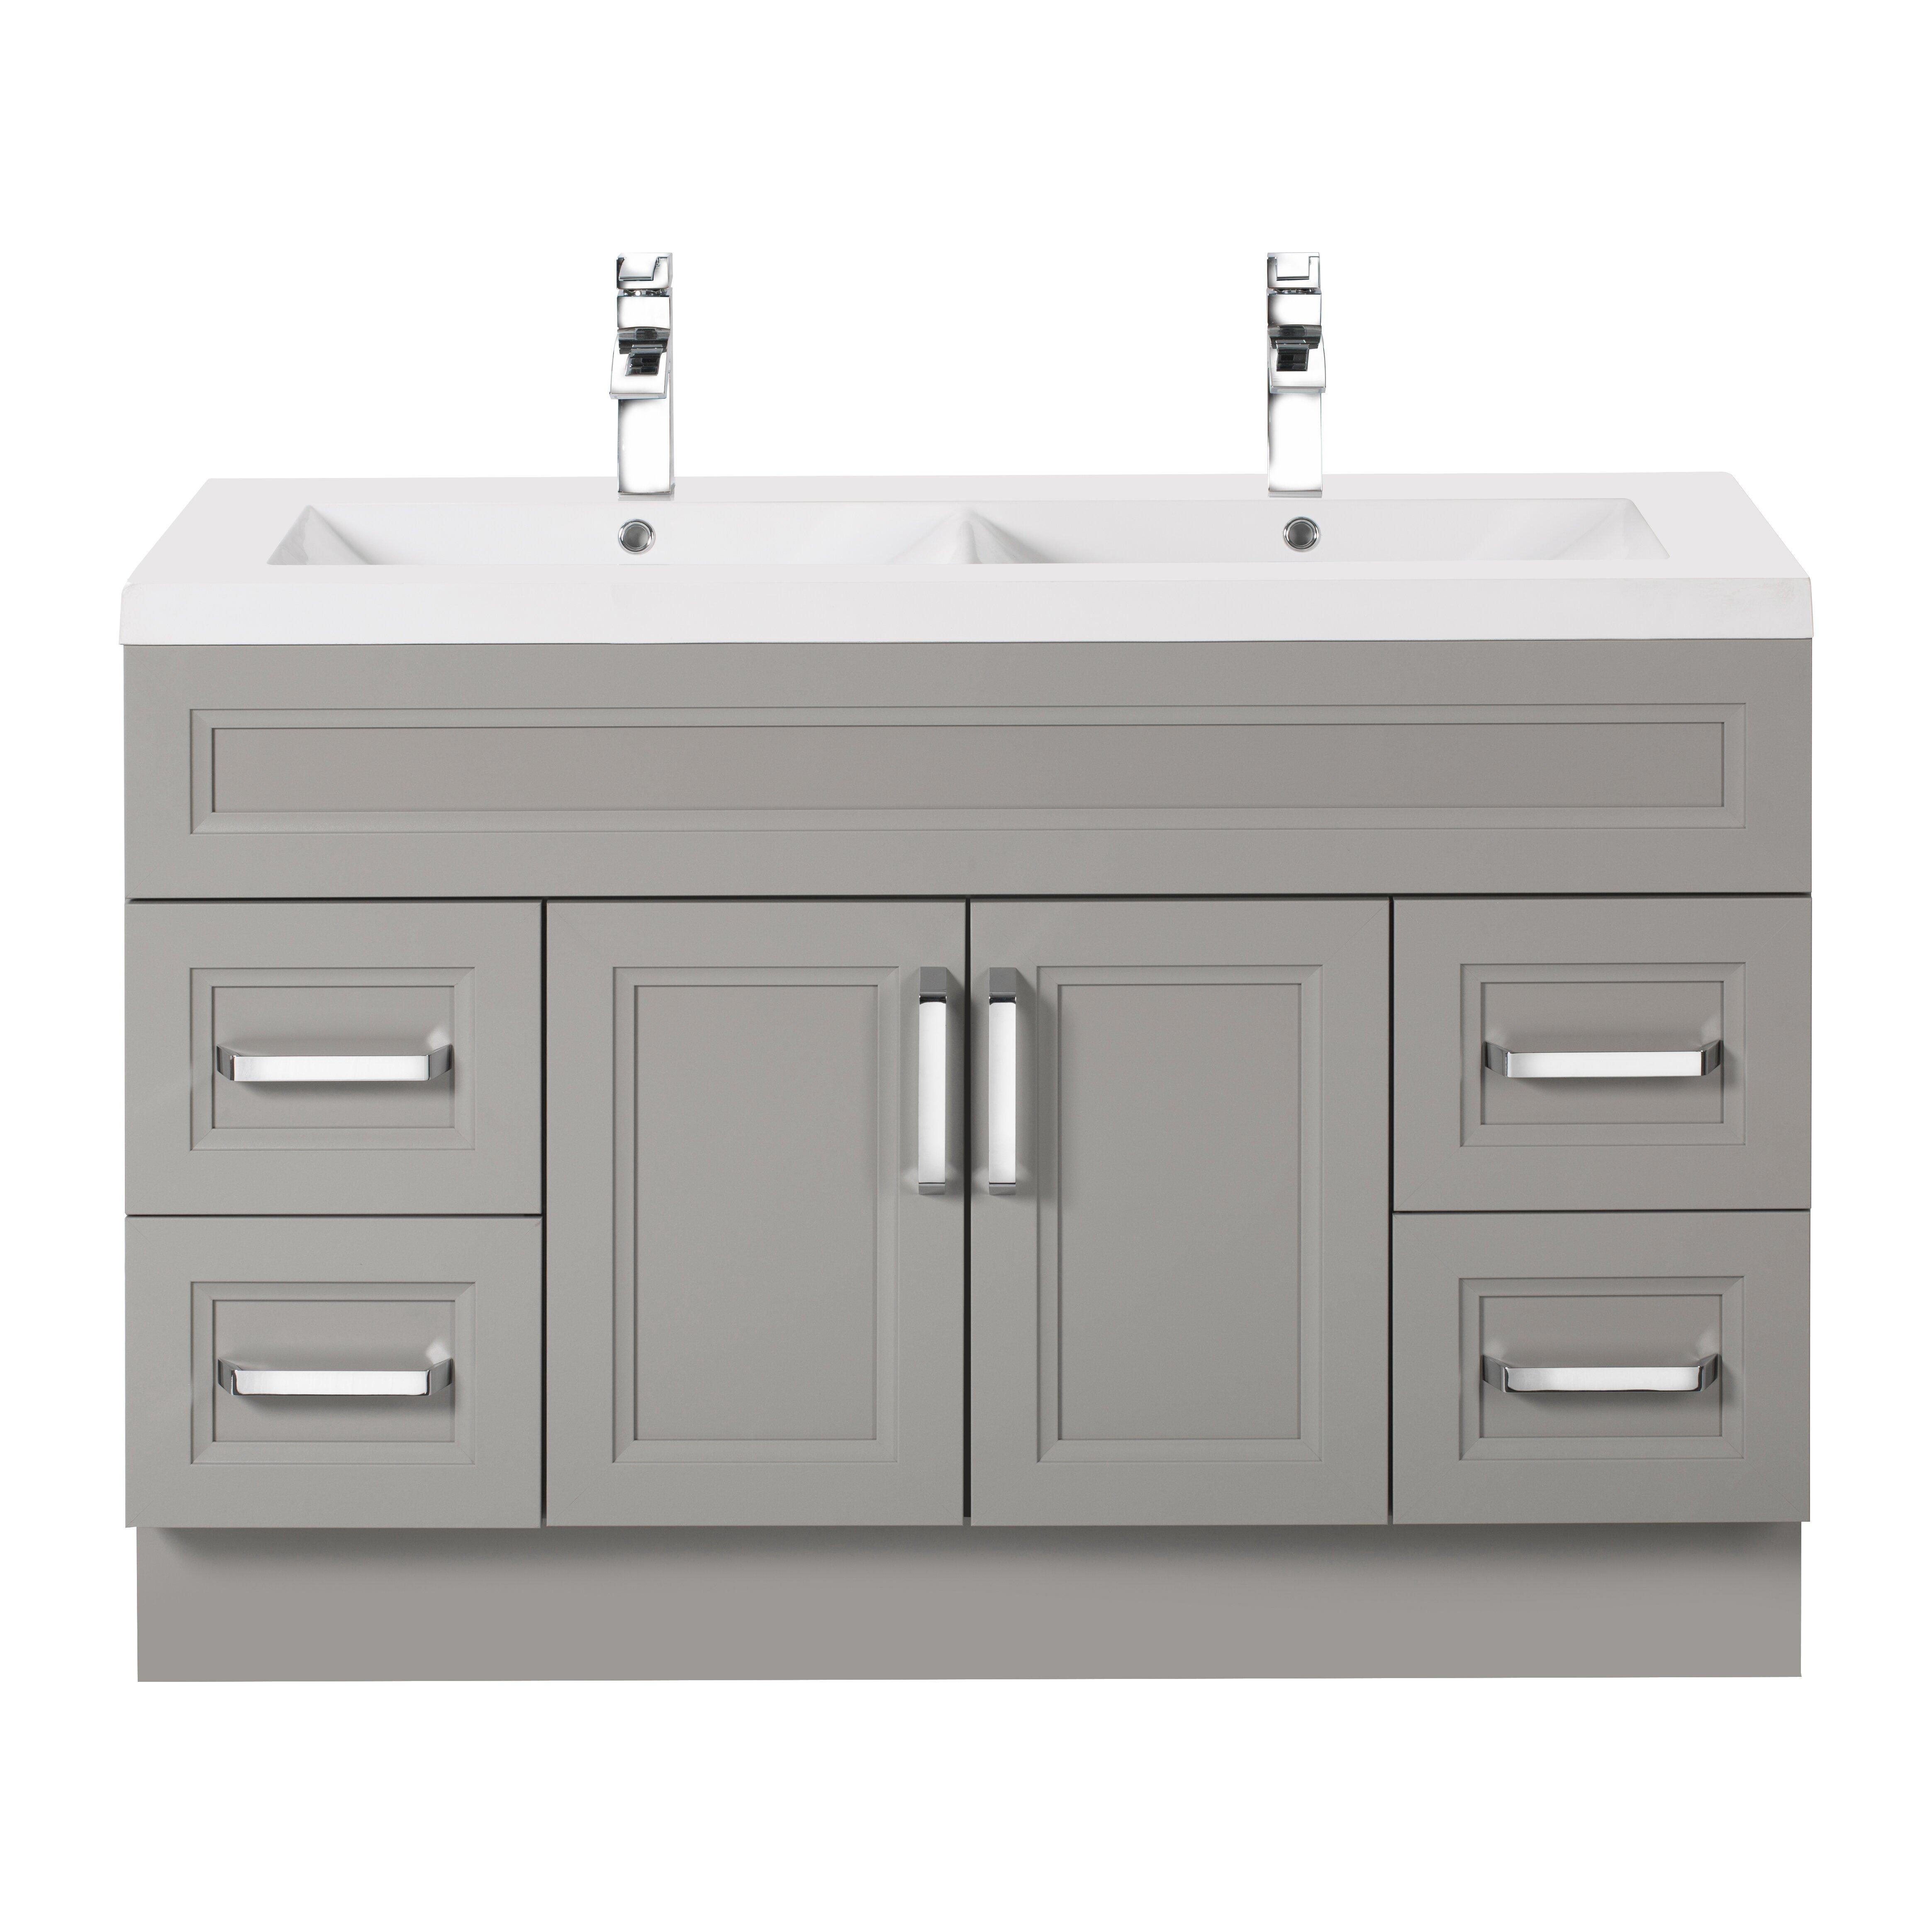 "Double Bowl Vanity Tops For Bathrooms: Cutler Kitchen & Bath Urban 48"" Vanity Double Bowl"